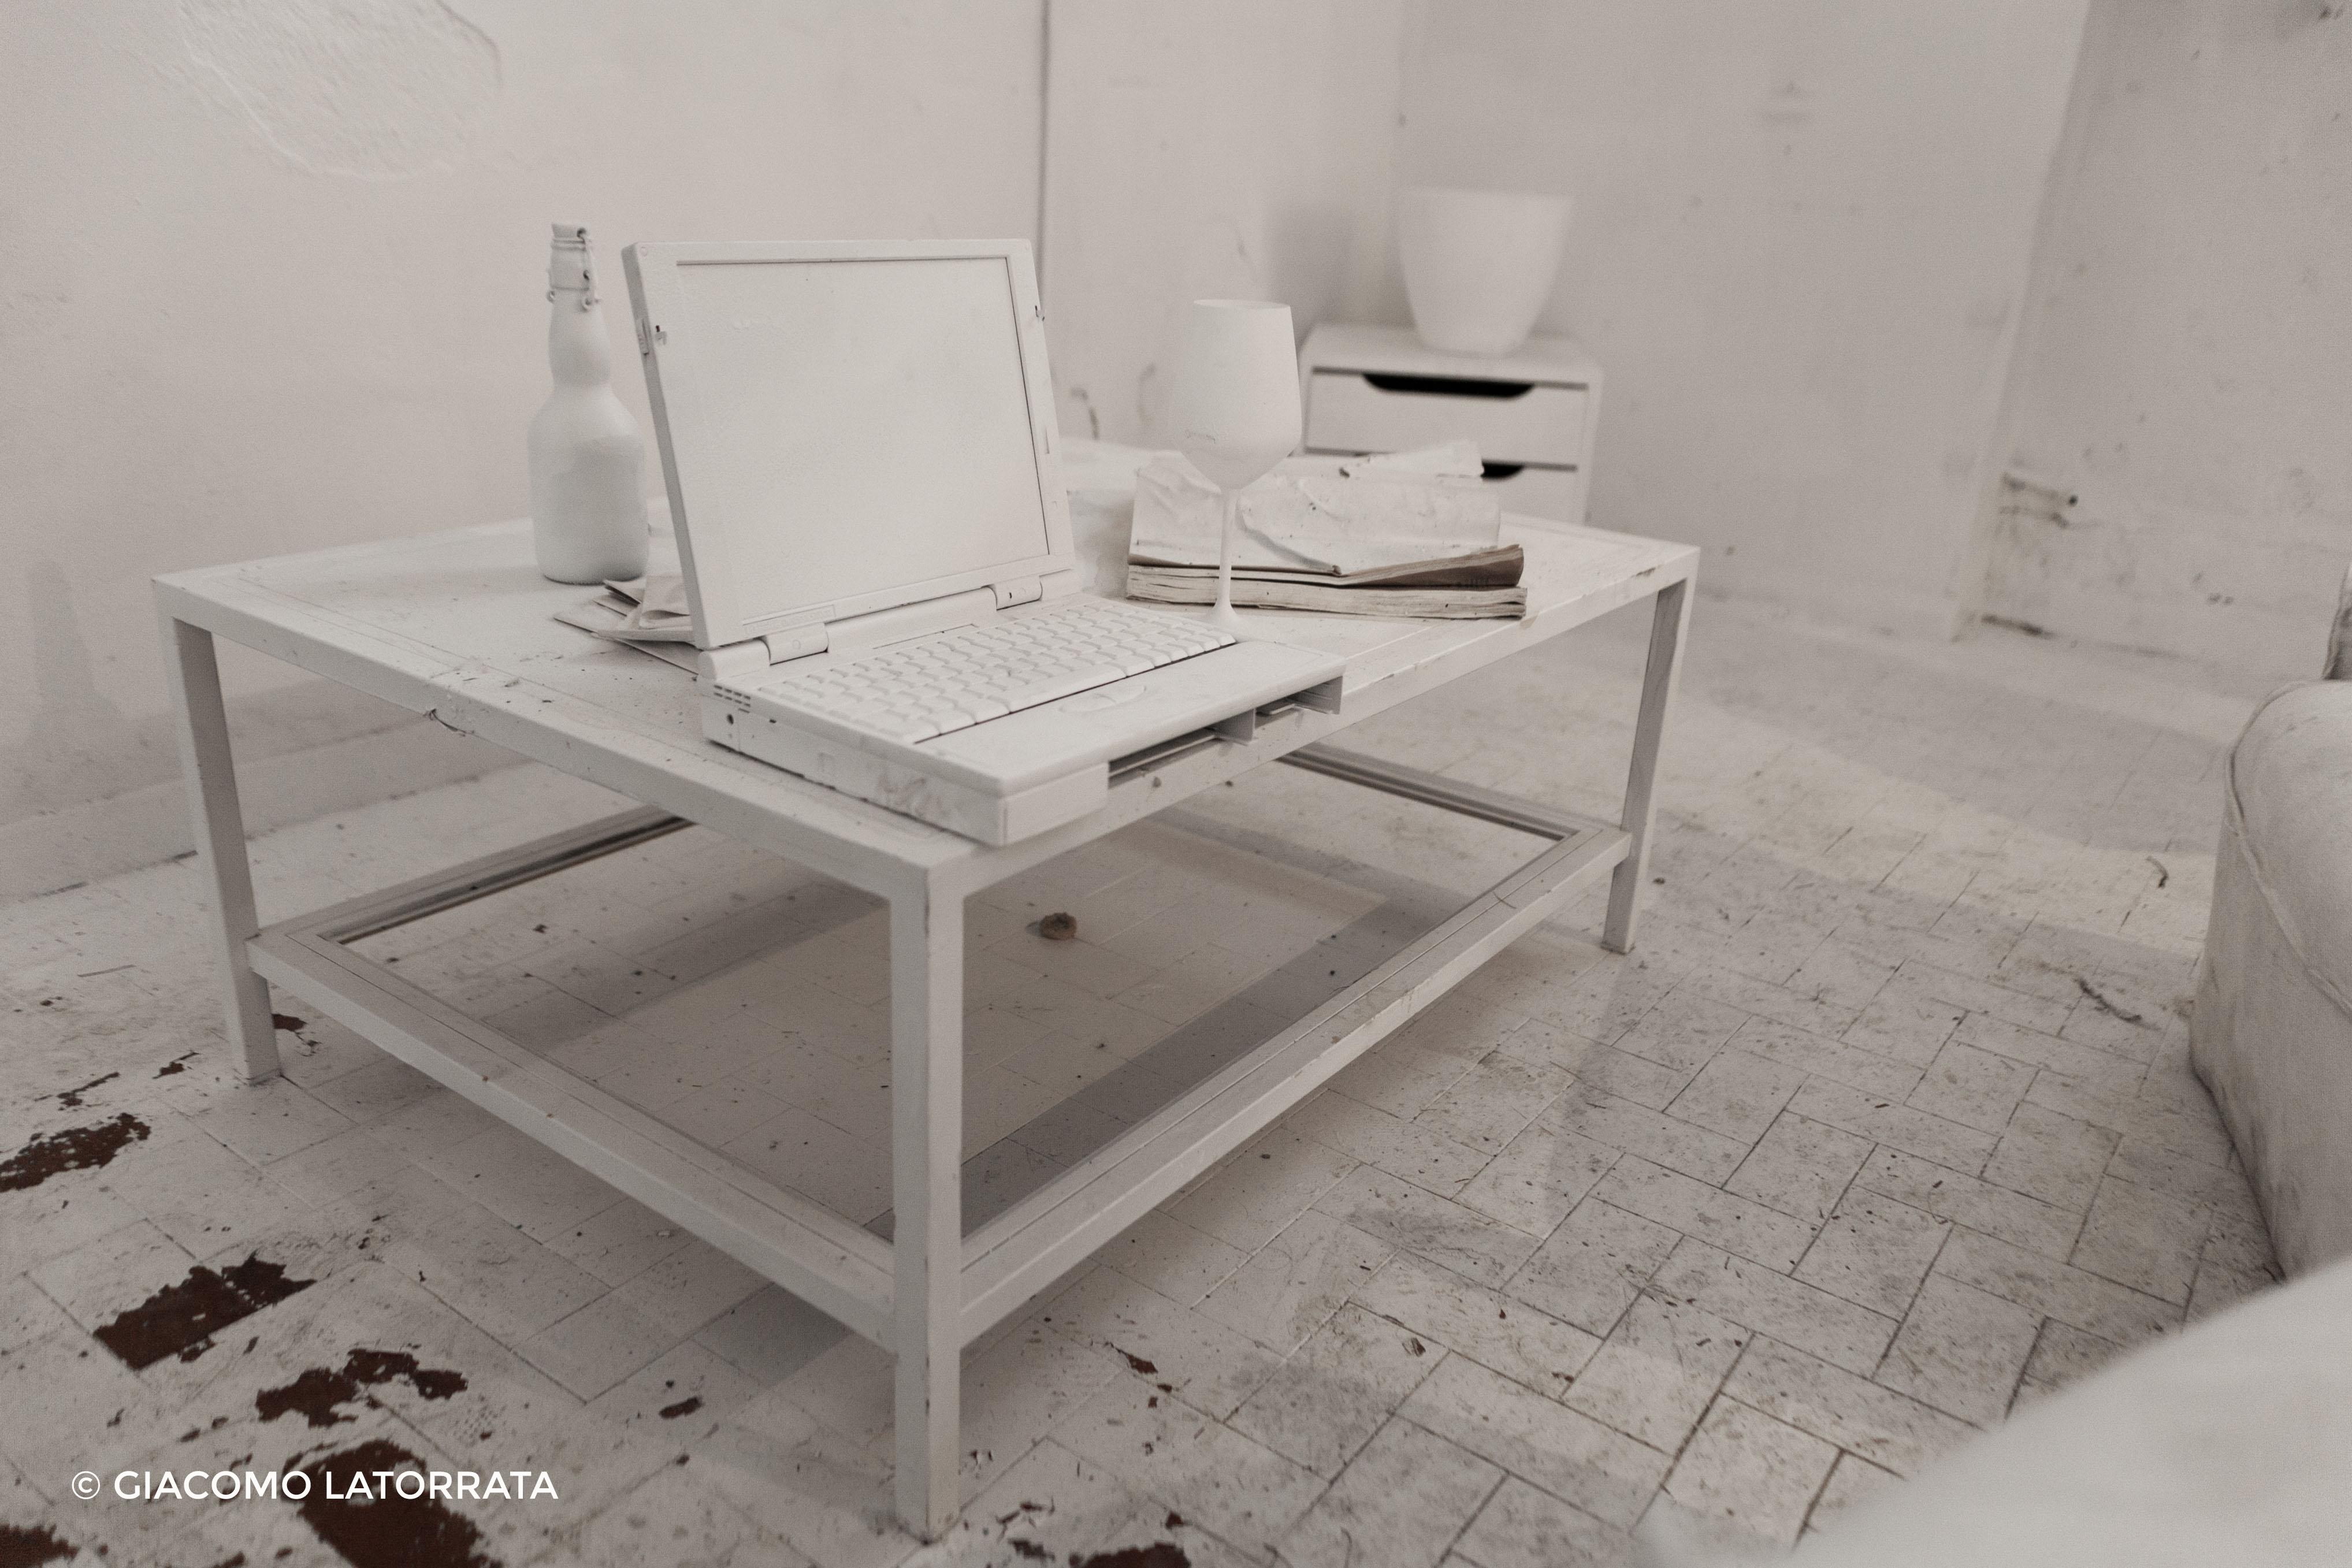 Tellas – Wunderkammer Gallery © Giacomo Latorrata